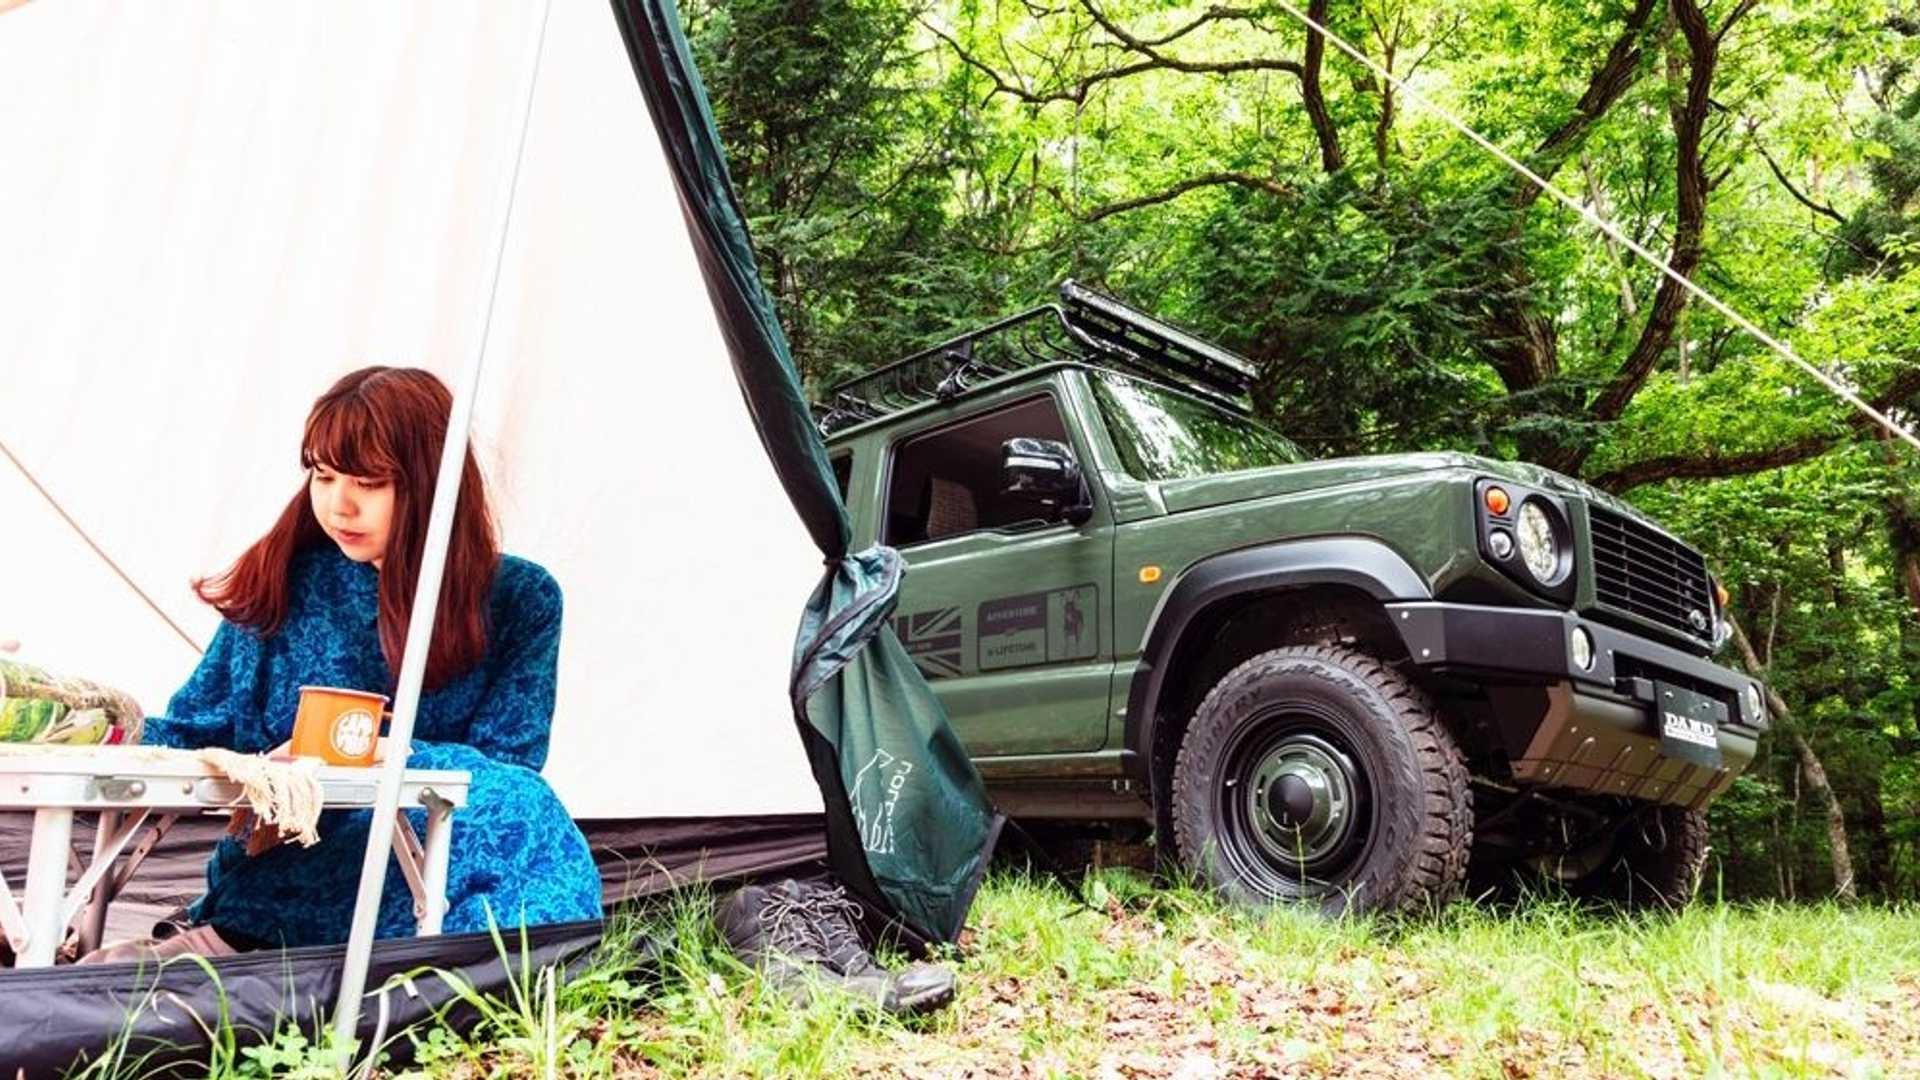 suzuki-jimny-little-d.-by-damd-camping